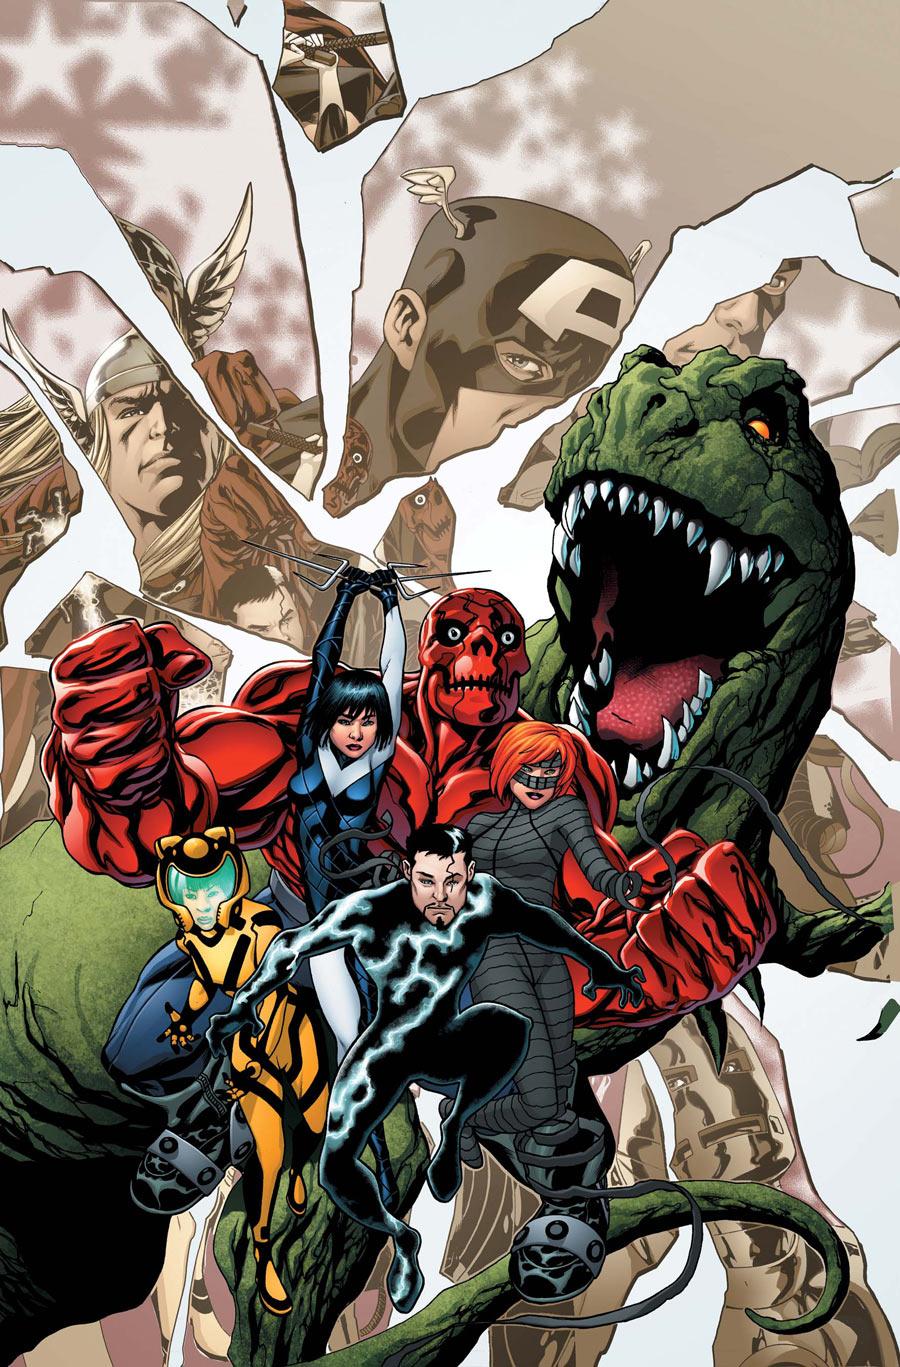 Avengers Academy Vol 1 12 Textless.jpg